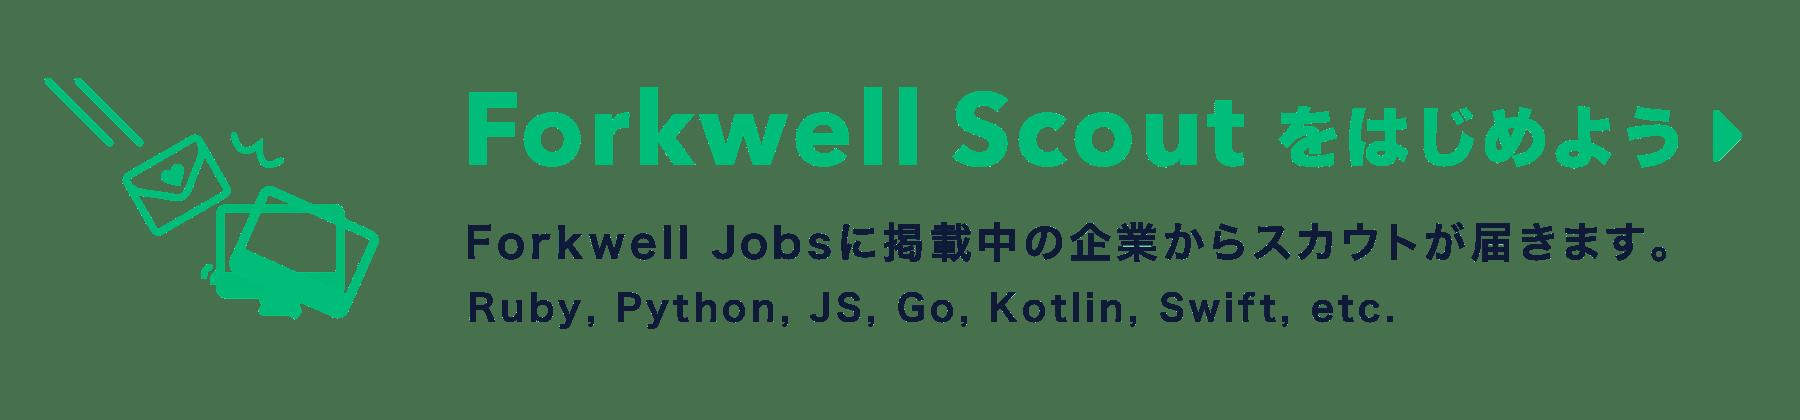 Forkwell Scout をはじめよう。Forkwell Jobsに掲載中の企業からスカウトが届きます。